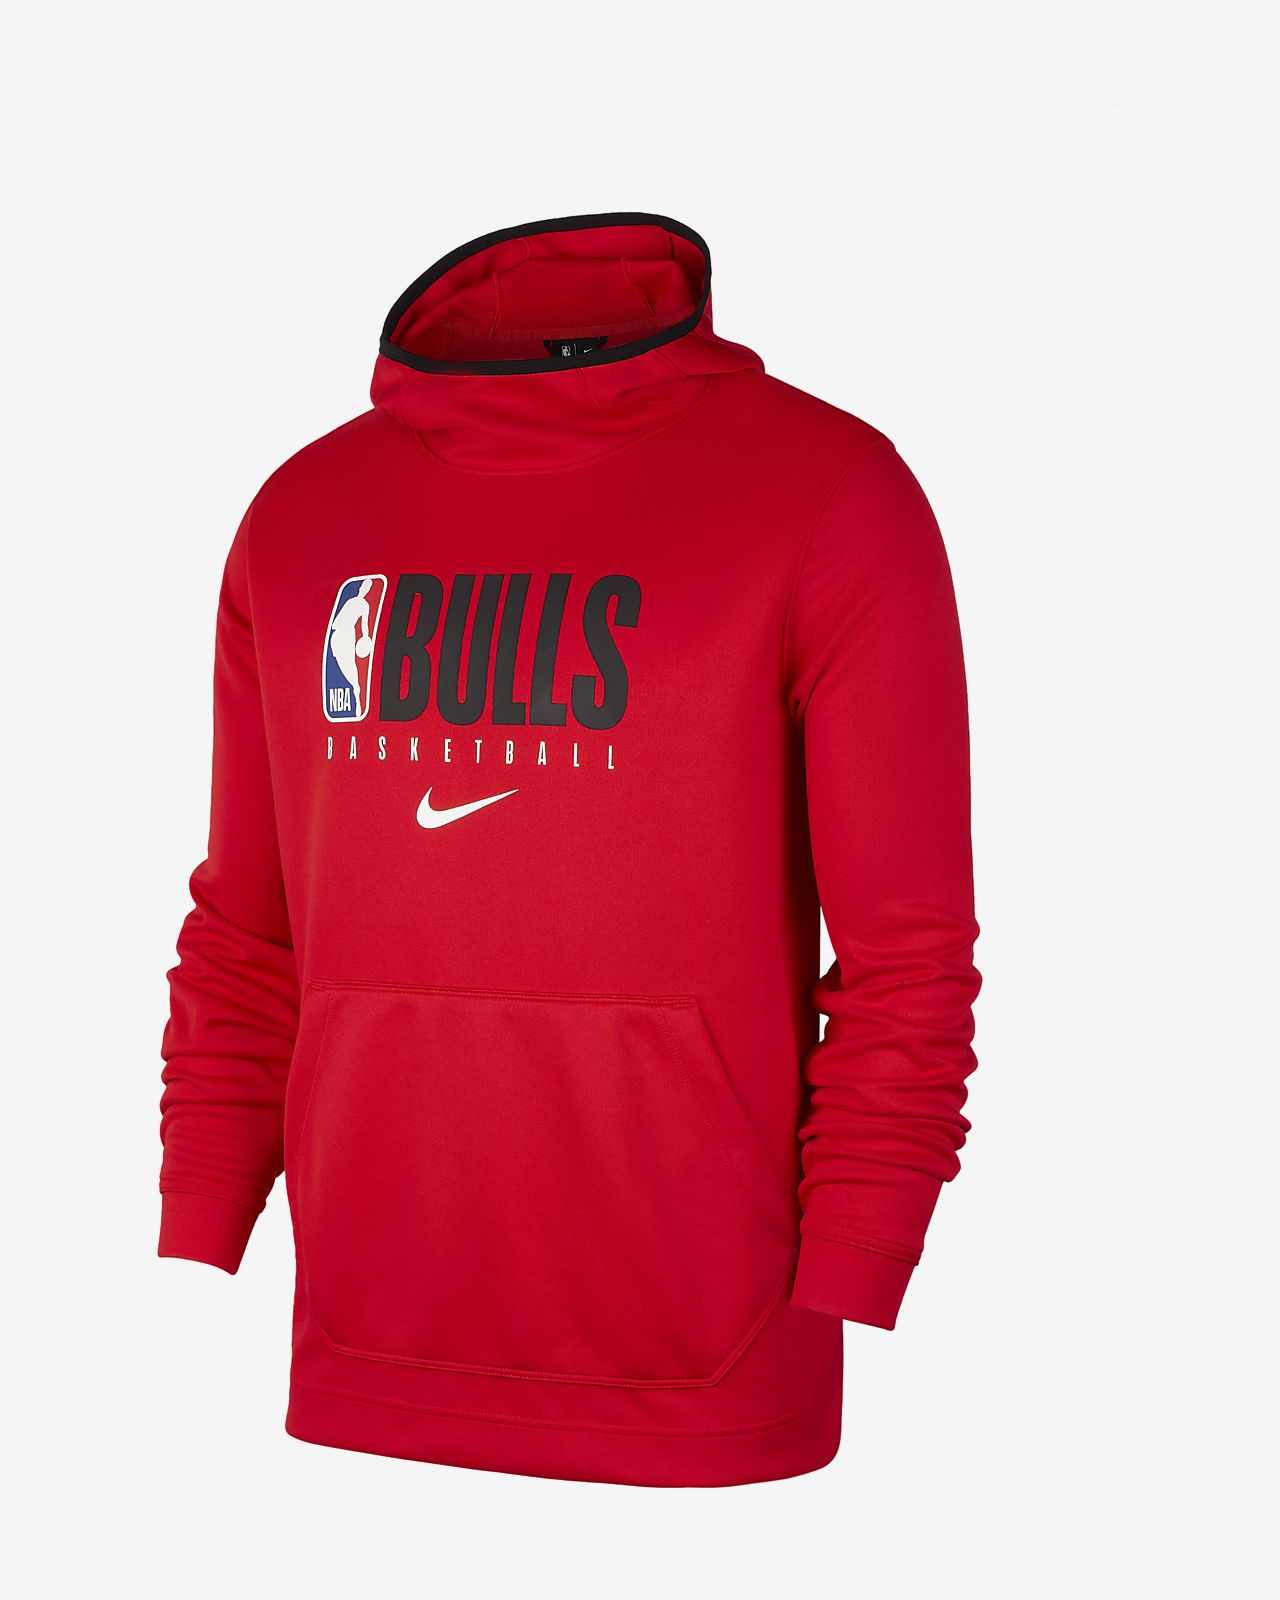 Felpa Chicago Bulls con cappuccio Nike Spotlight NBA - Uomo